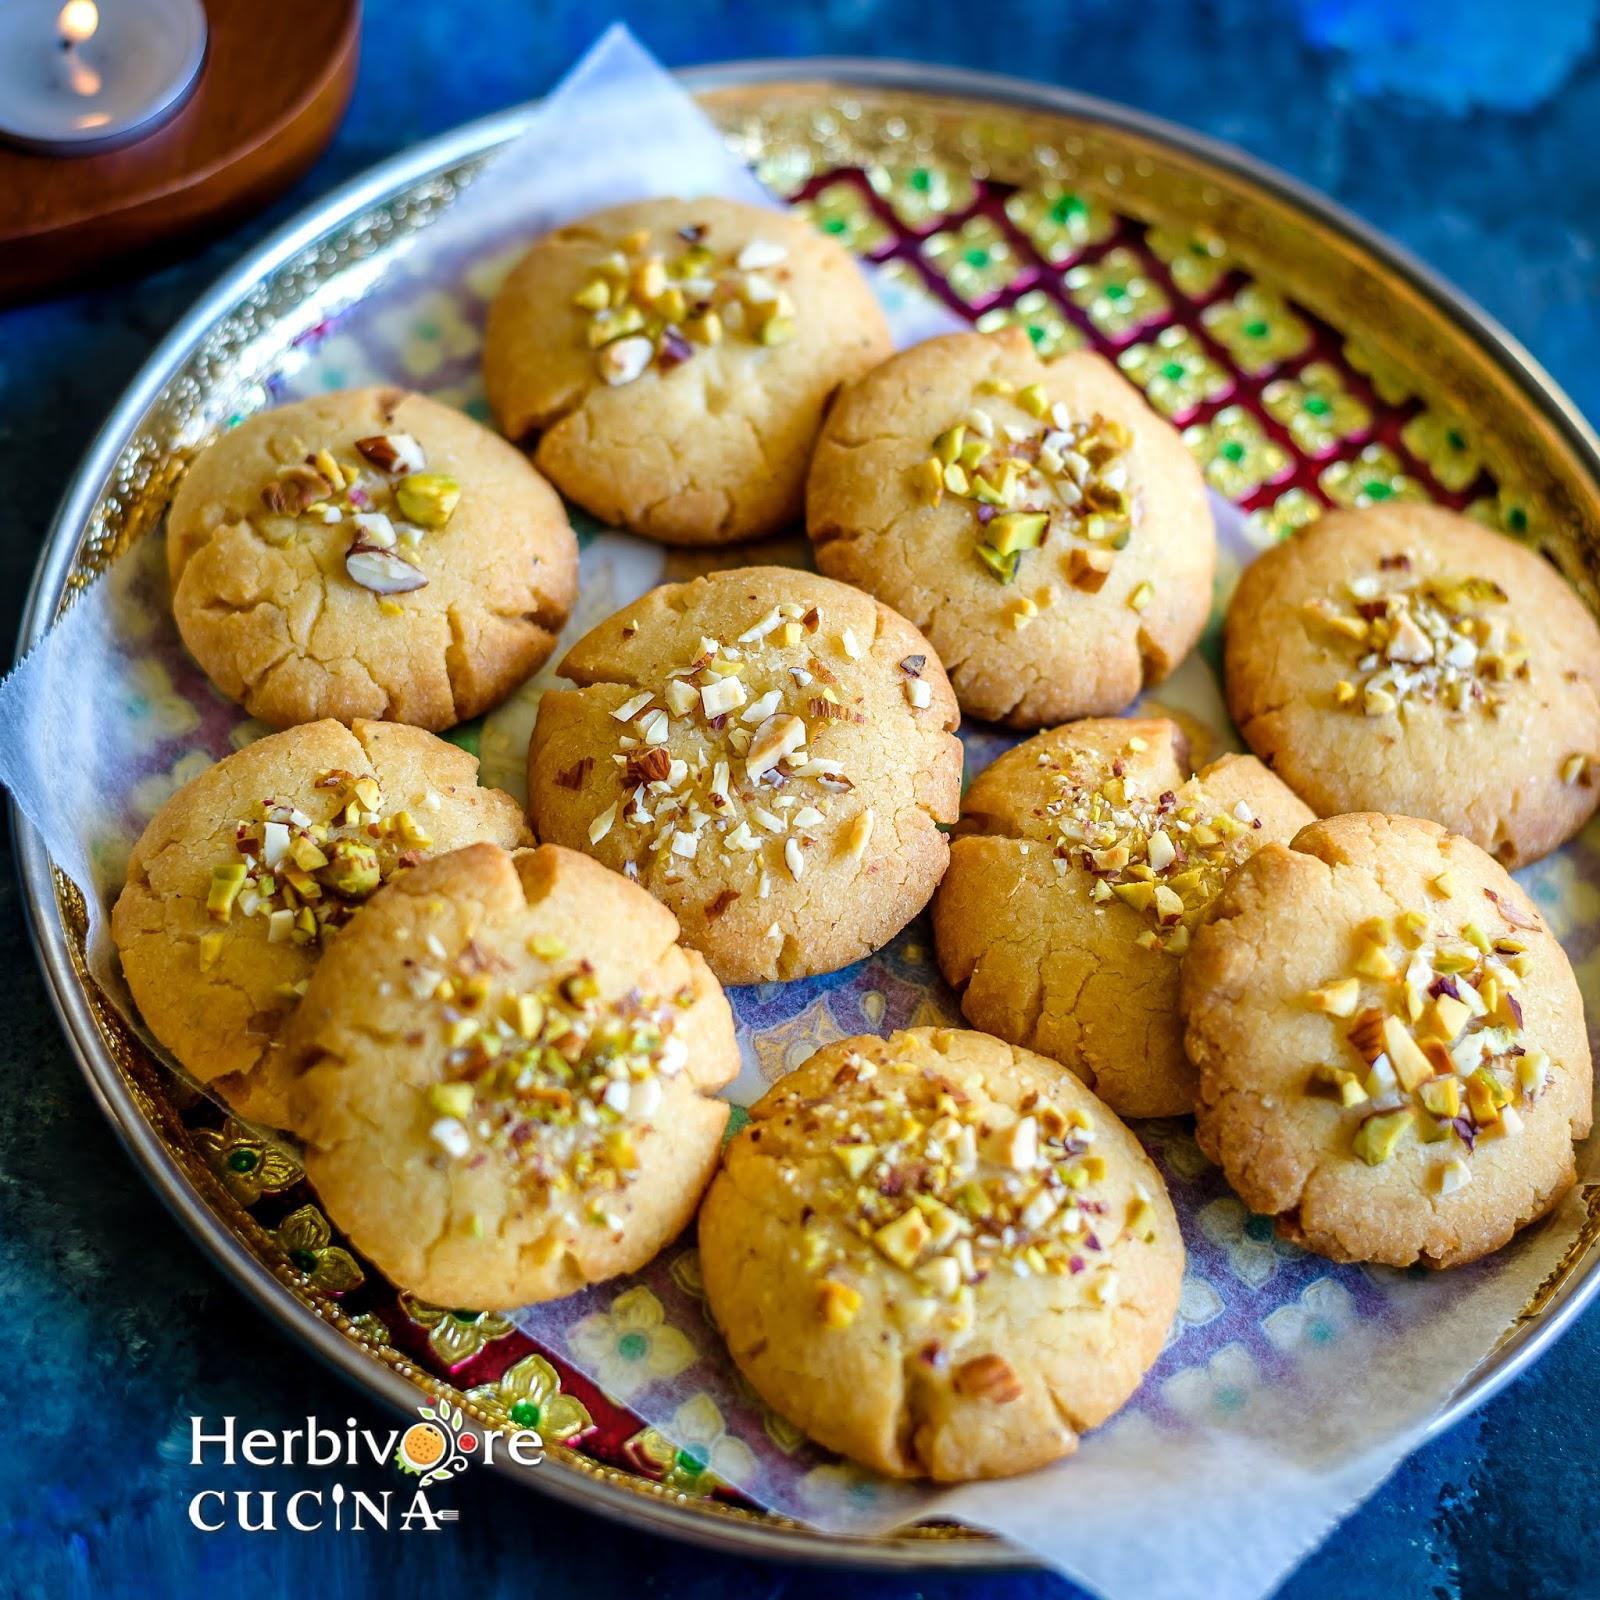 Herbivore Cucina: Nankhatai (Indian Shortbread Cookies)